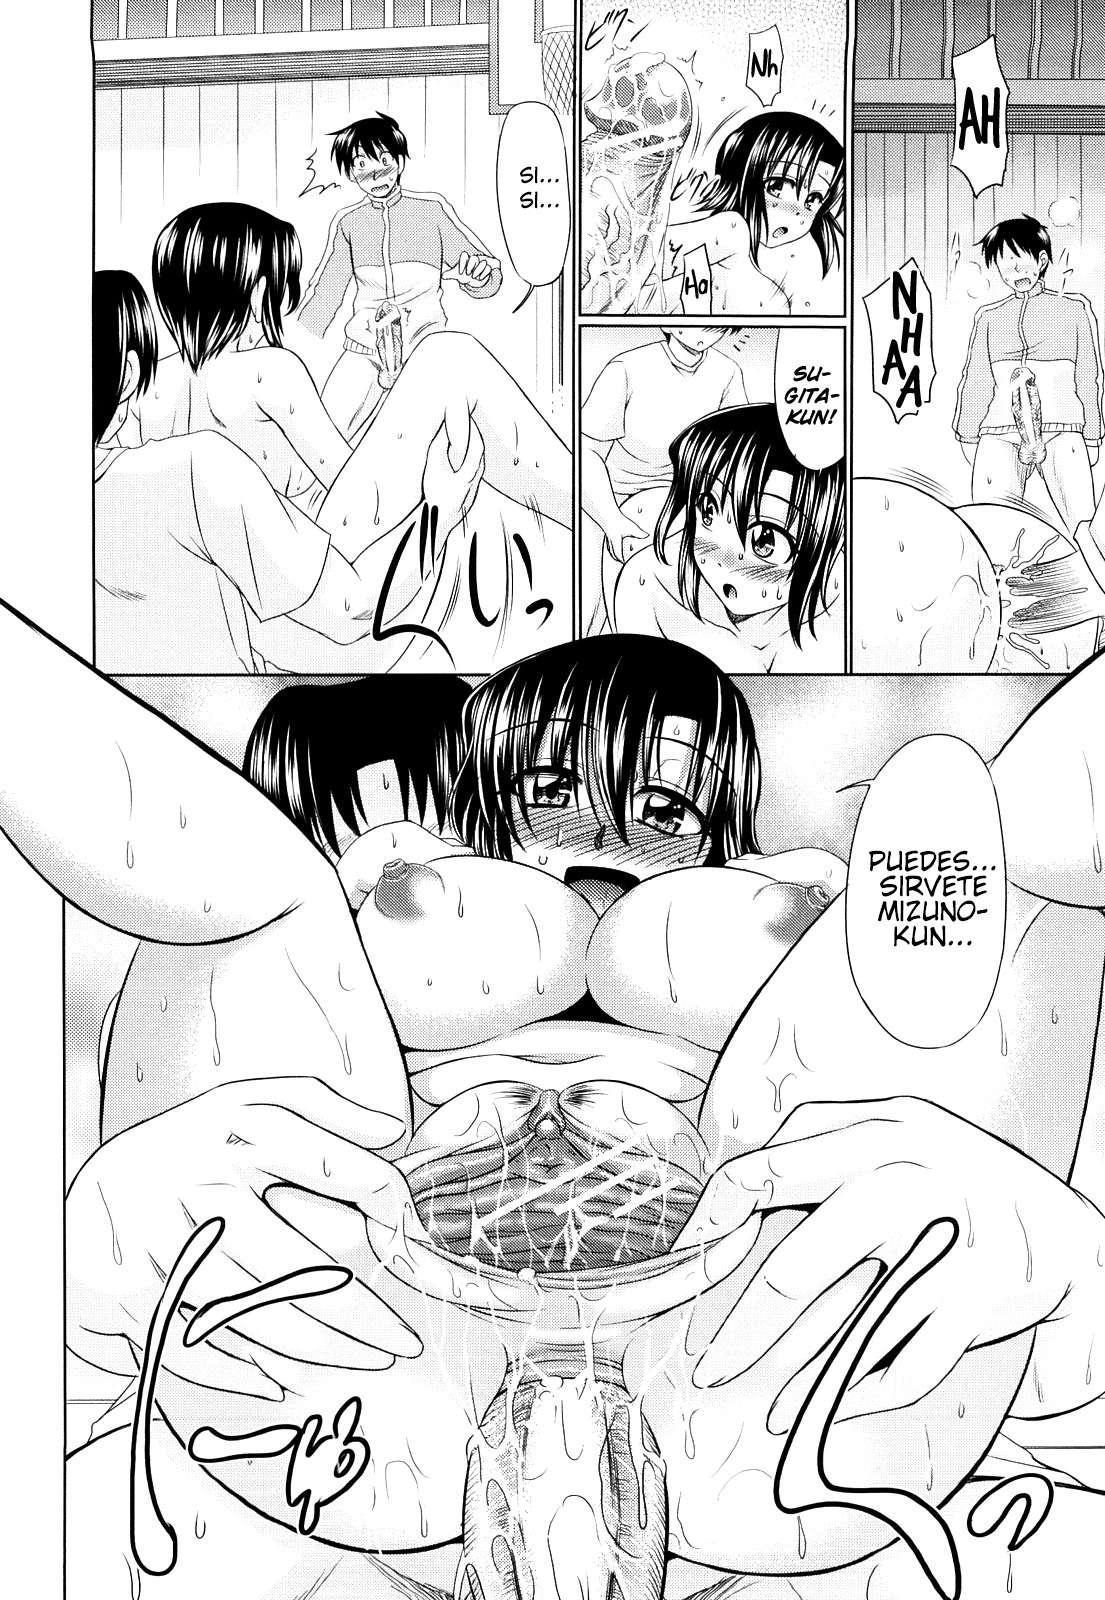 Nikuyoku Analyze♥ Chapter-9 - 13